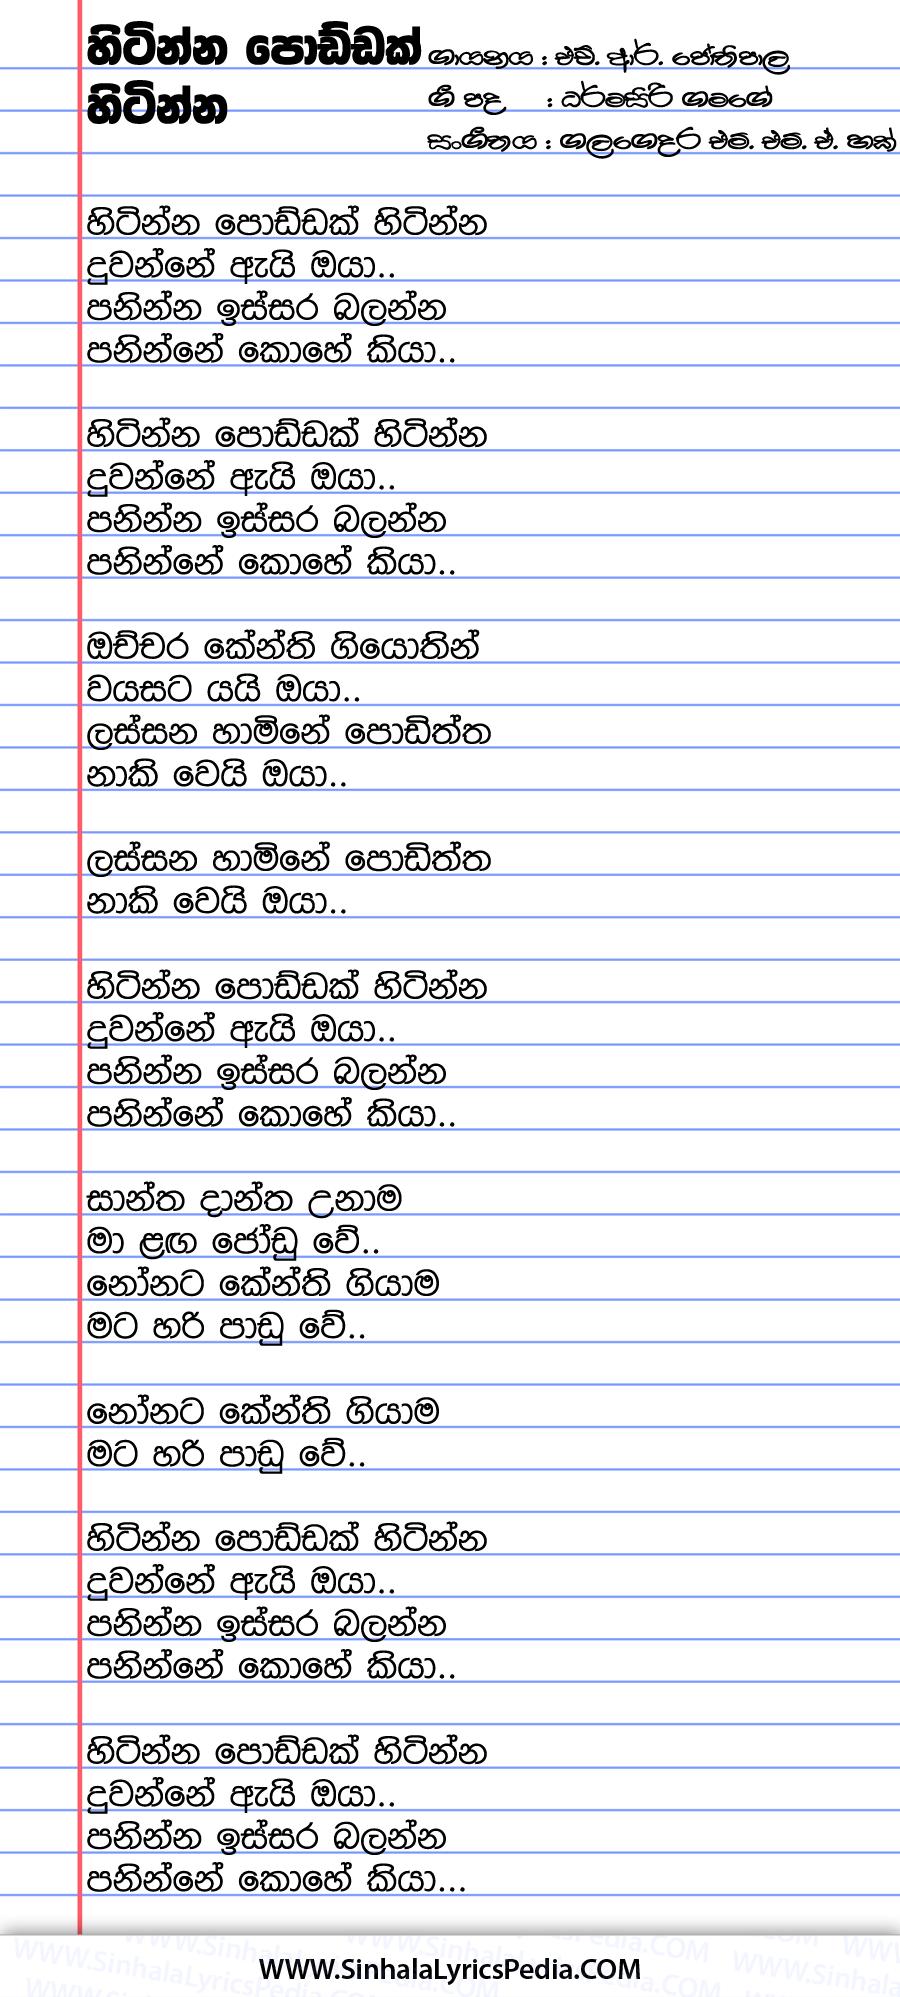 Hitinna Poddak Hitinna Song Lyrics